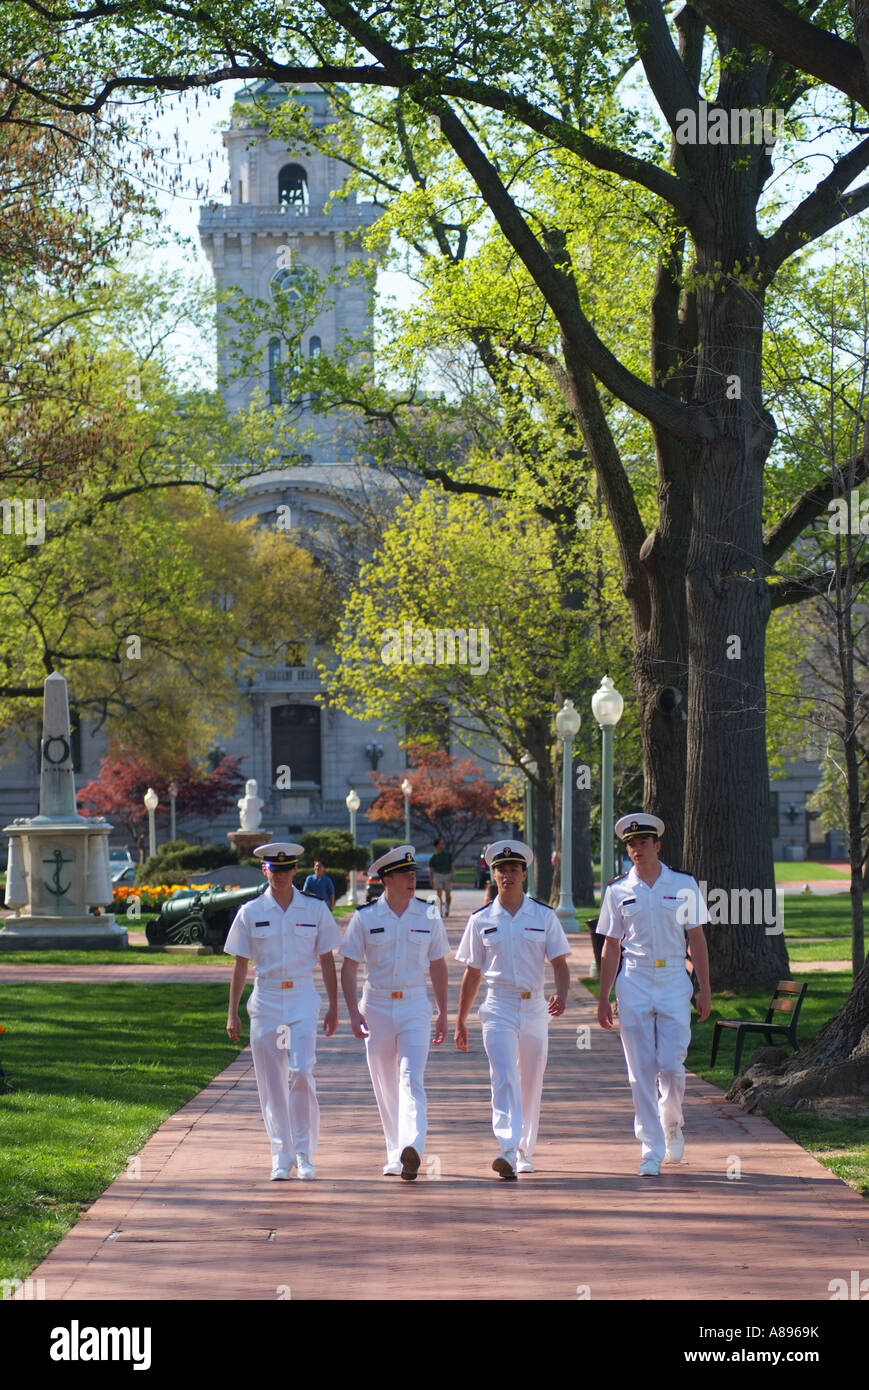 midshipmen-wall-on-the-campus-yard-of-the-u-s-naval-academy-A8969K.jpg